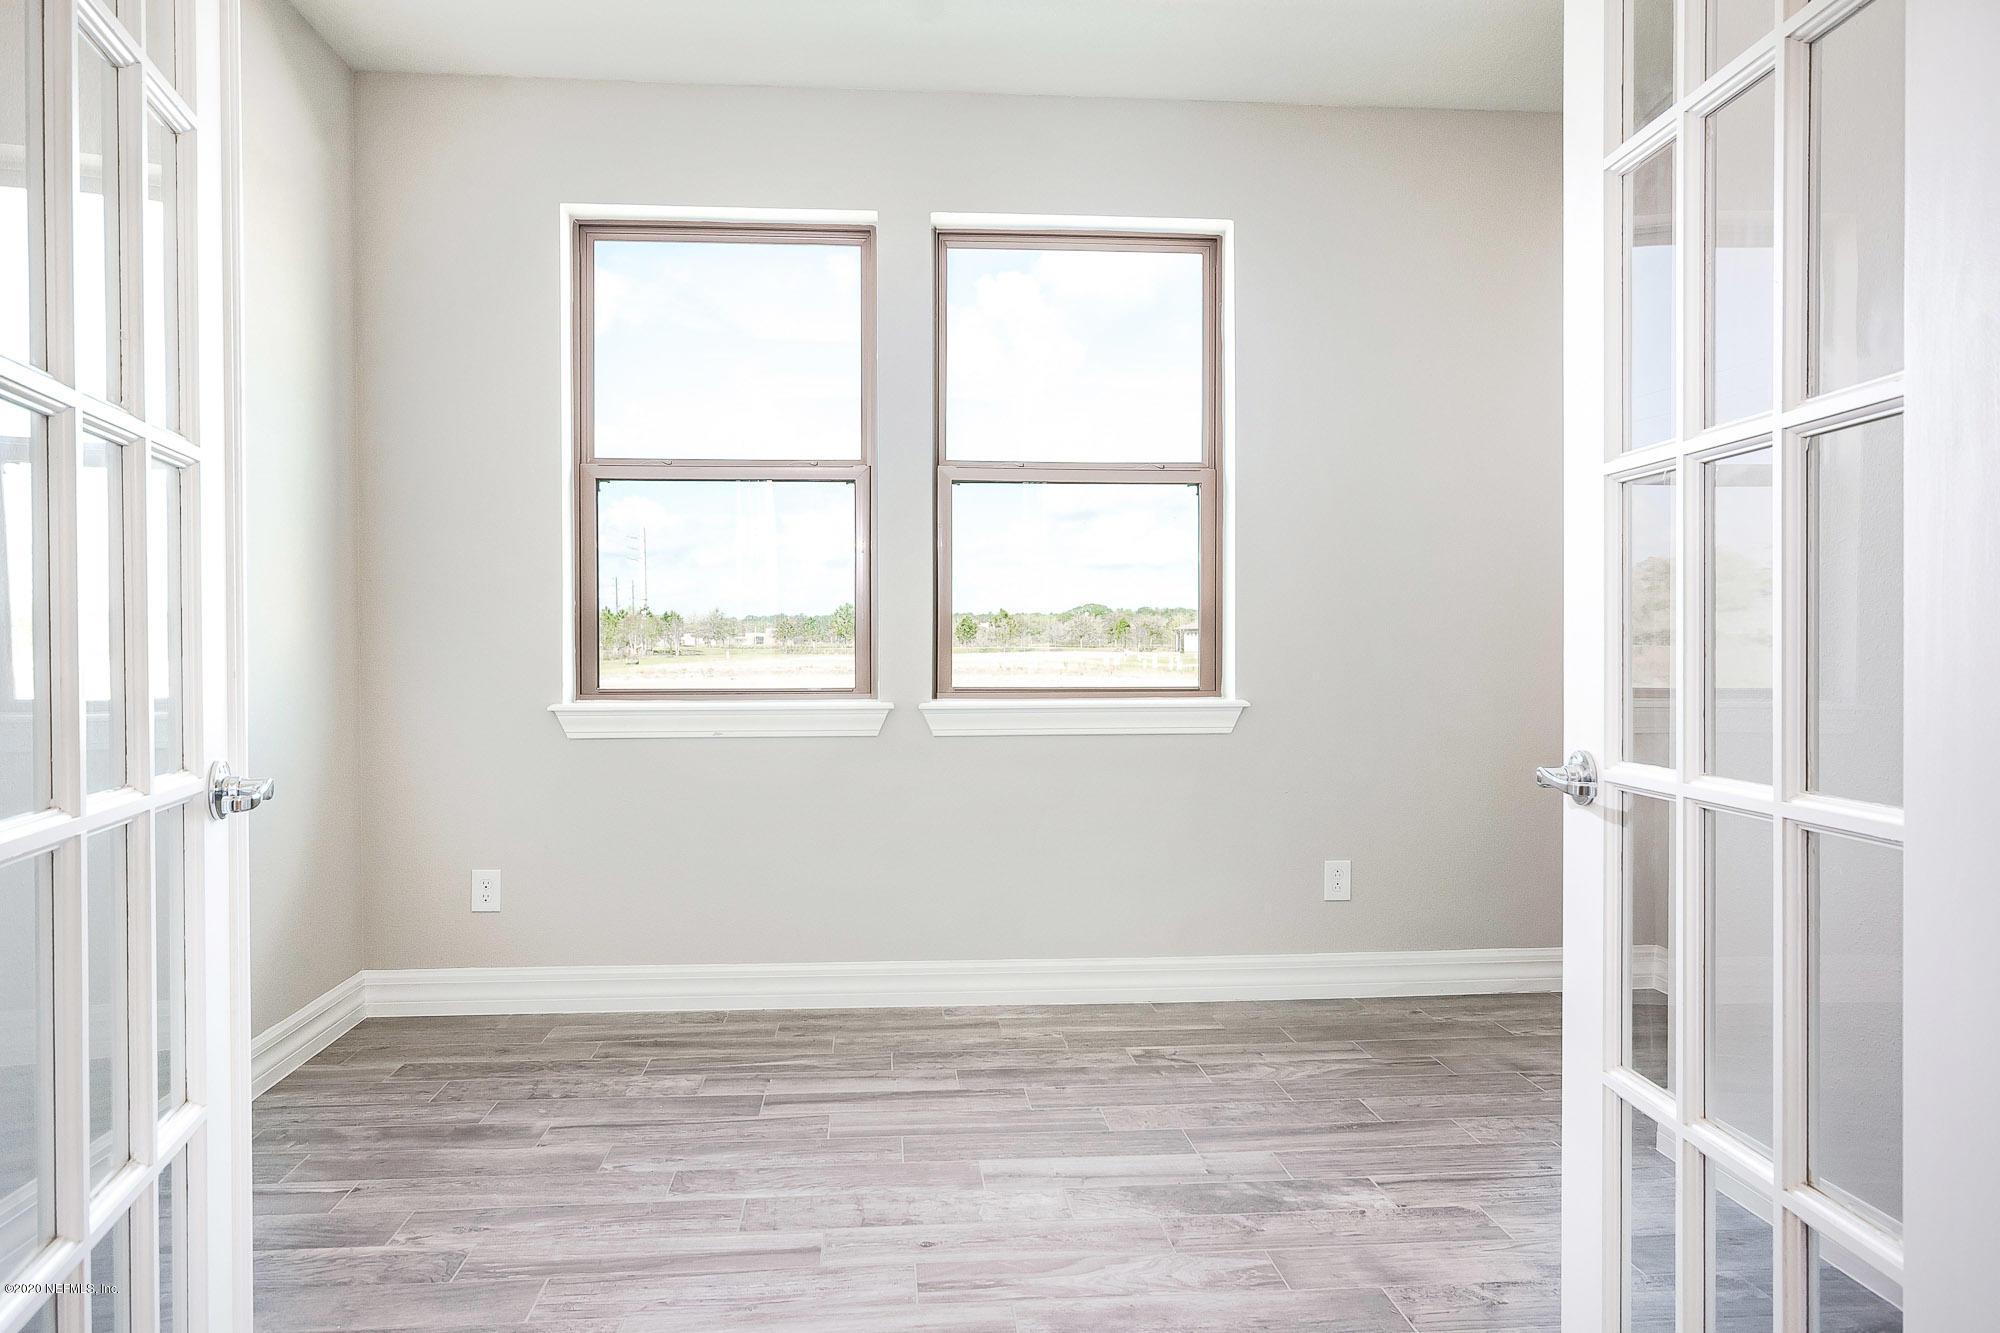 75 ROCK SPRING, ST AUGUSTINE, FLORIDA 32095, 2 Bedrooms Bedrooms, ,2 BathroomsBathrooms,Residential,For sale,ROCK SPRING,1051151